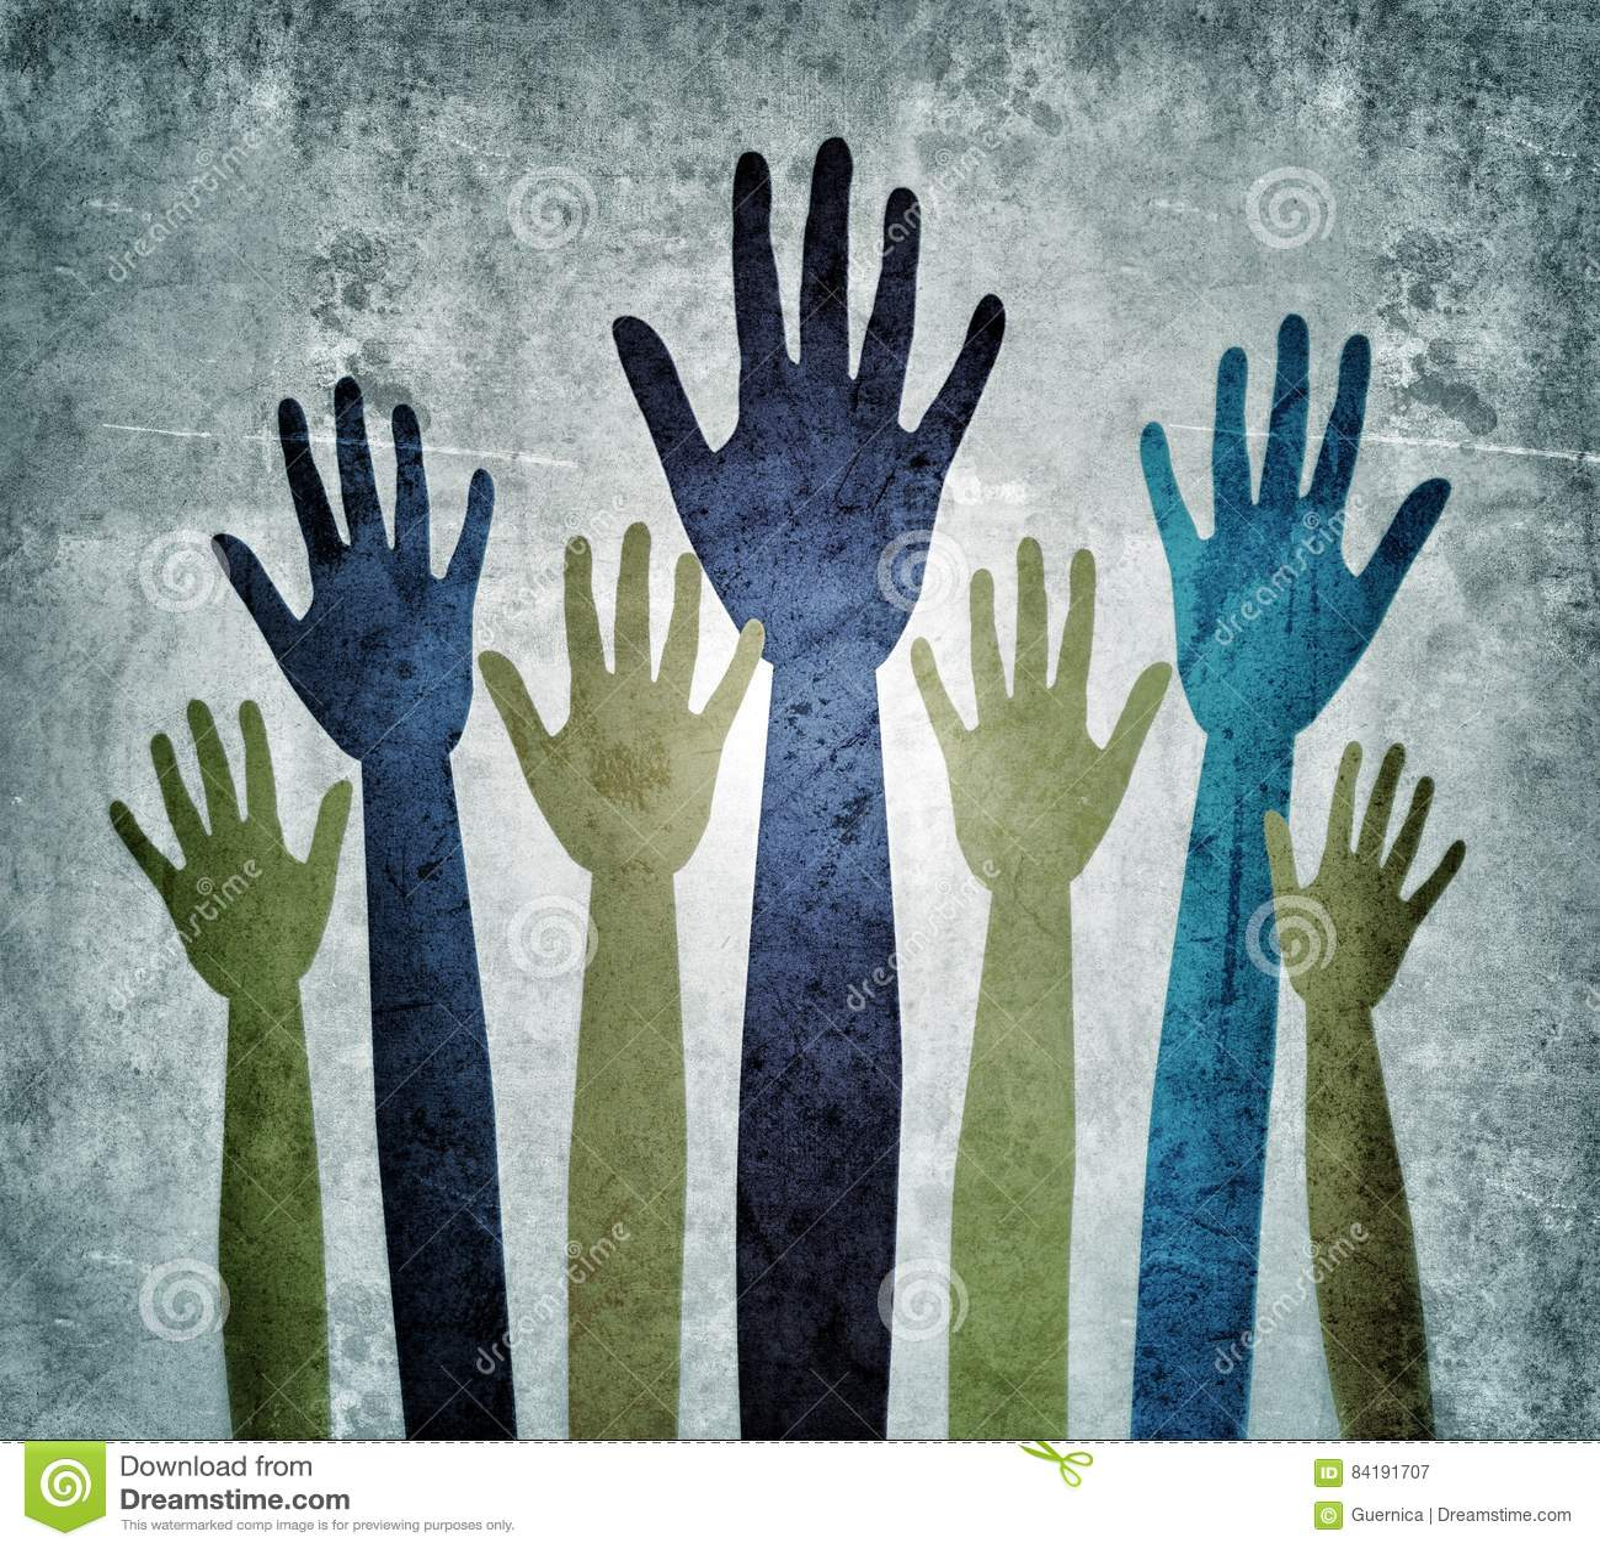 Seeking help Hands reaching out